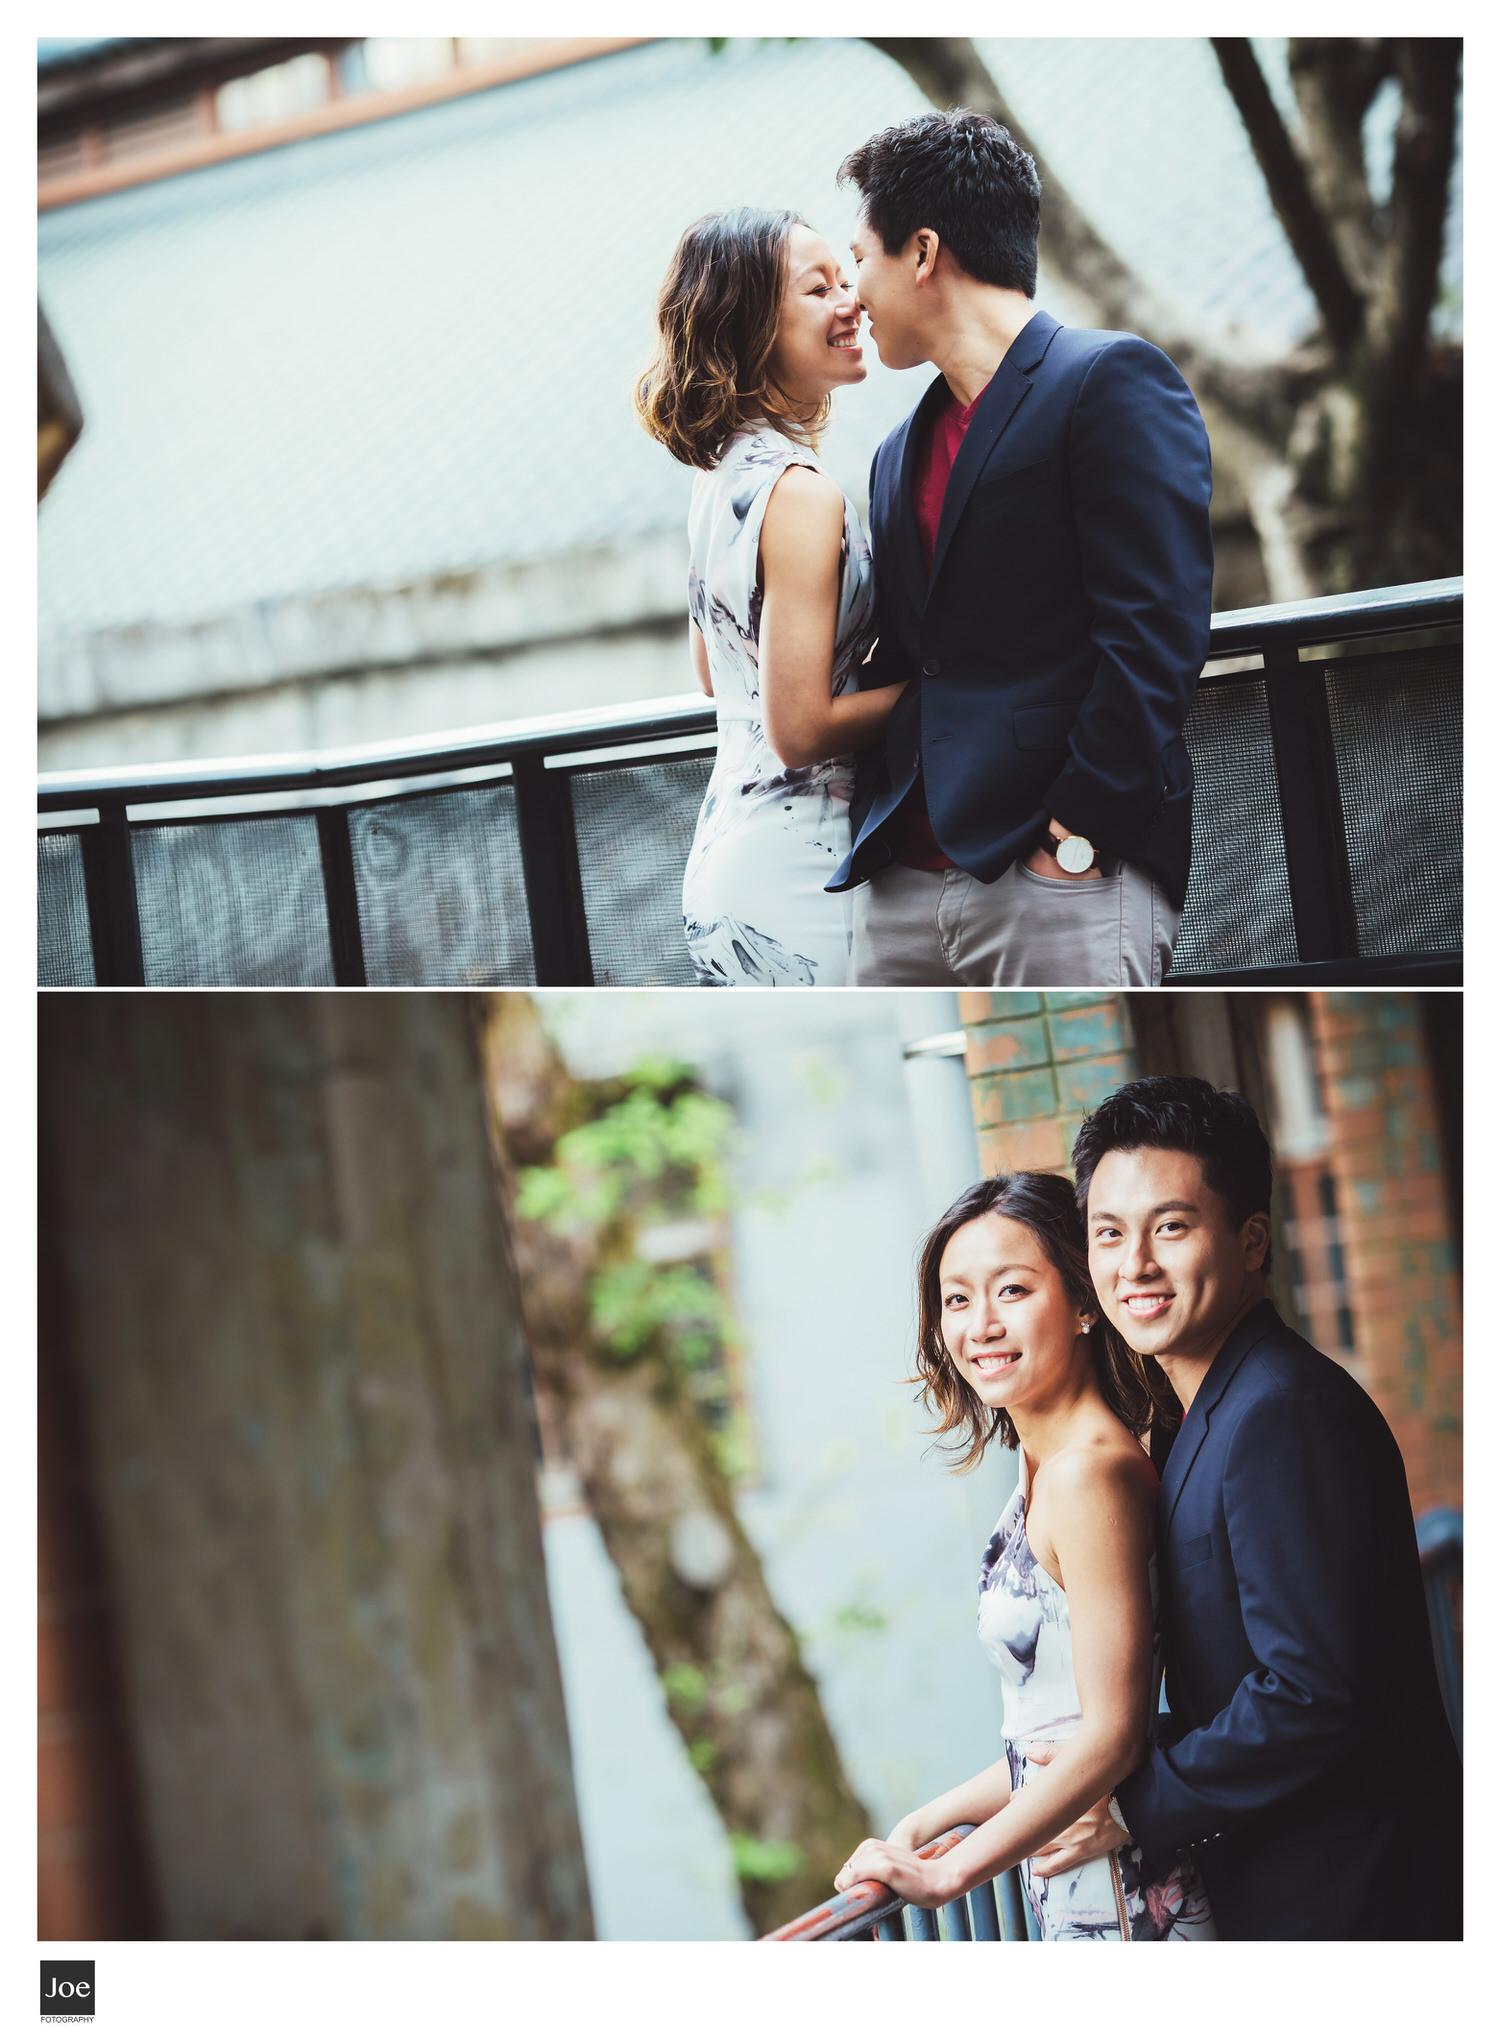 joefotography-taiwan-pre-wedding-annie-aaron-30.jpg